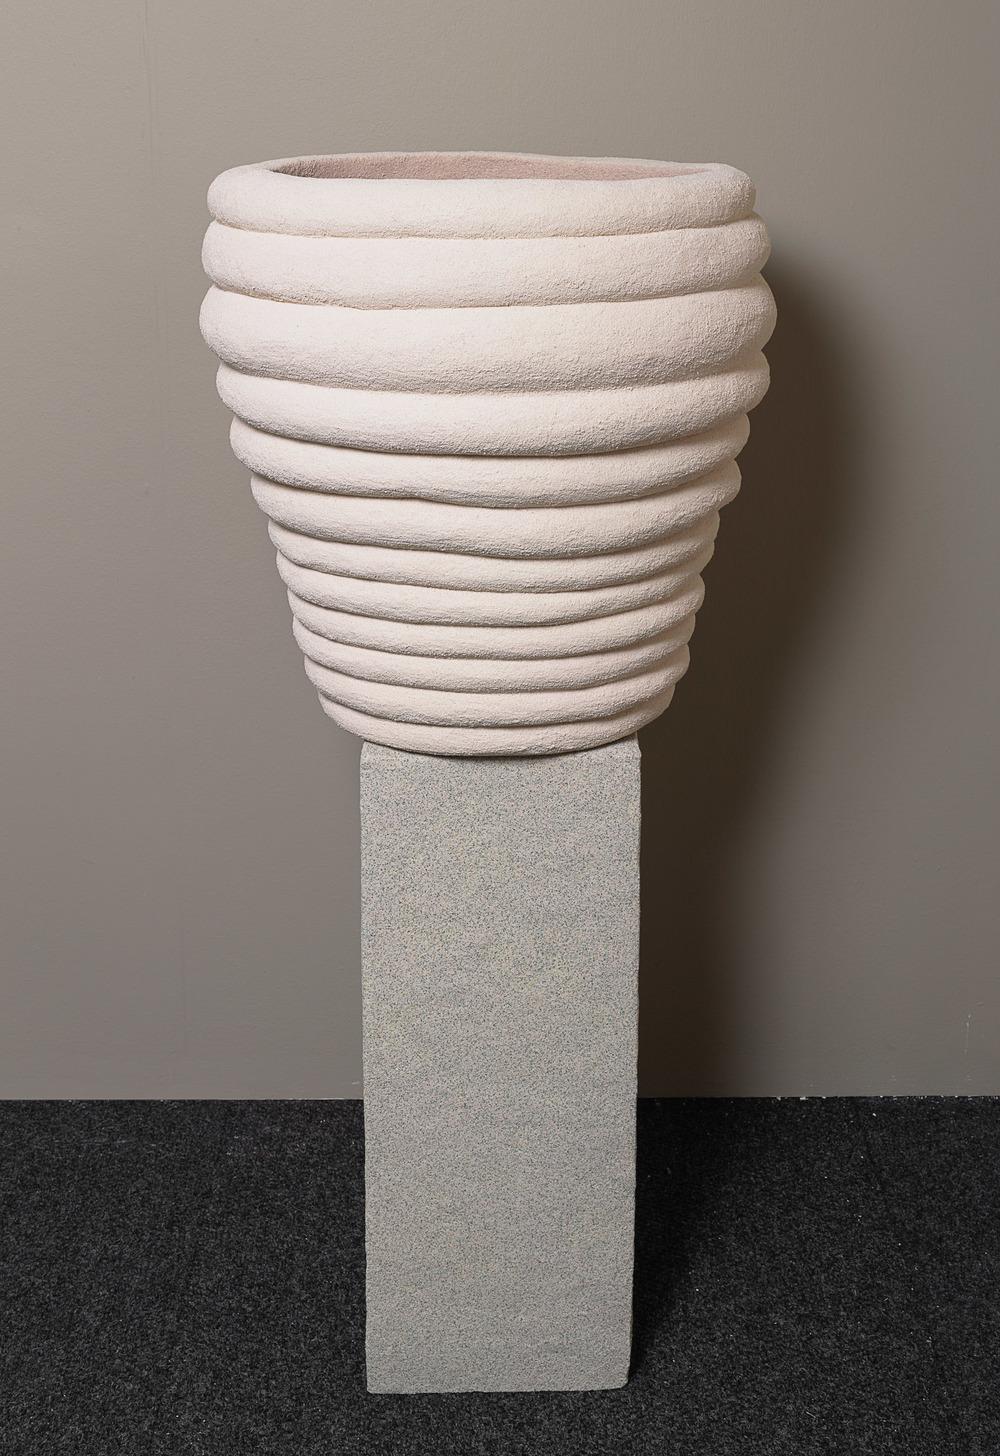 Rachel Higgins   , Vessel,    2015  , Styrofoam, foam pipe insulation, pool noodle, polystyrene, fiberglass, cement, cerastone  , 25 x 24 in. diameter   ; Organizer  , 2015,  Polystyrene, fiberglass, cement, cerastone  , 34 x 12 x 12.5 in.